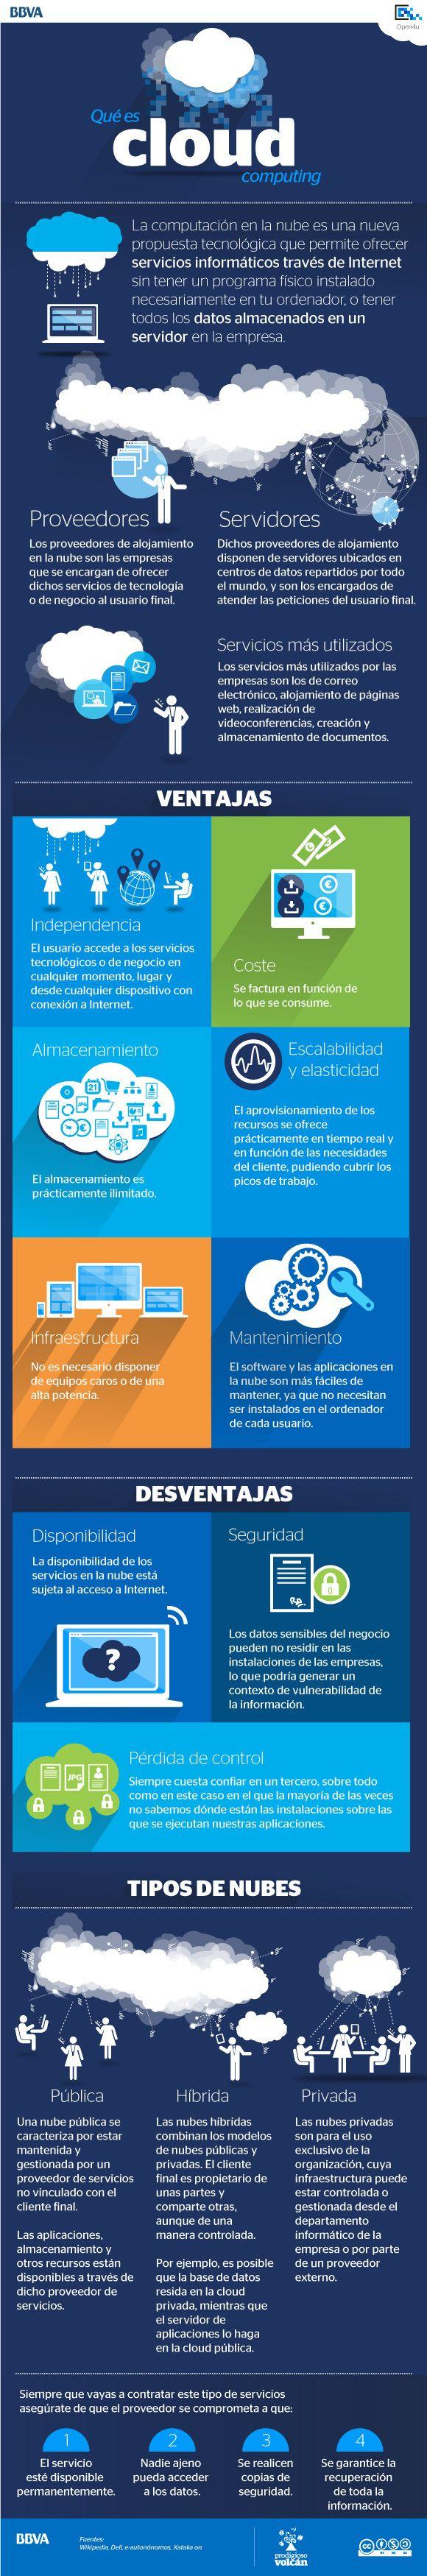 Qué es Cloud Computing #infografia #infographic #cloudcomputing